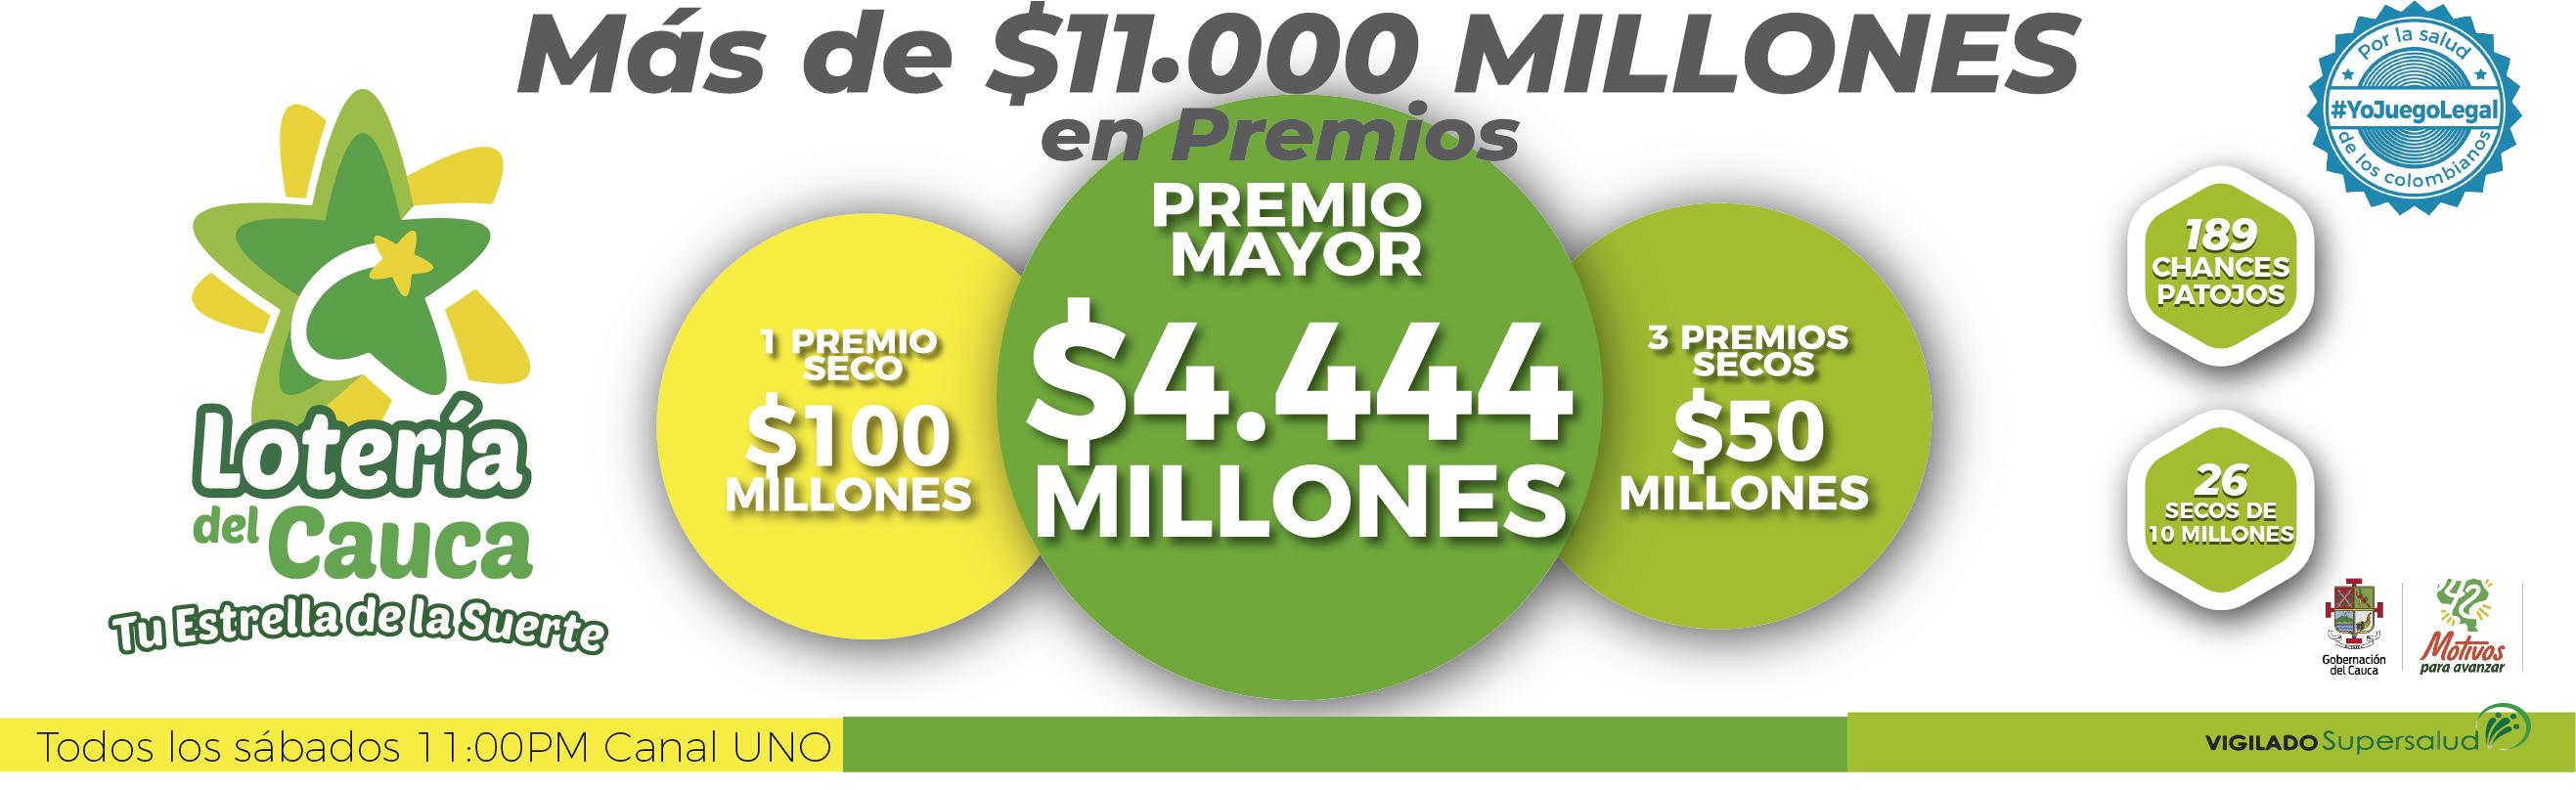 Loteria del Cauca